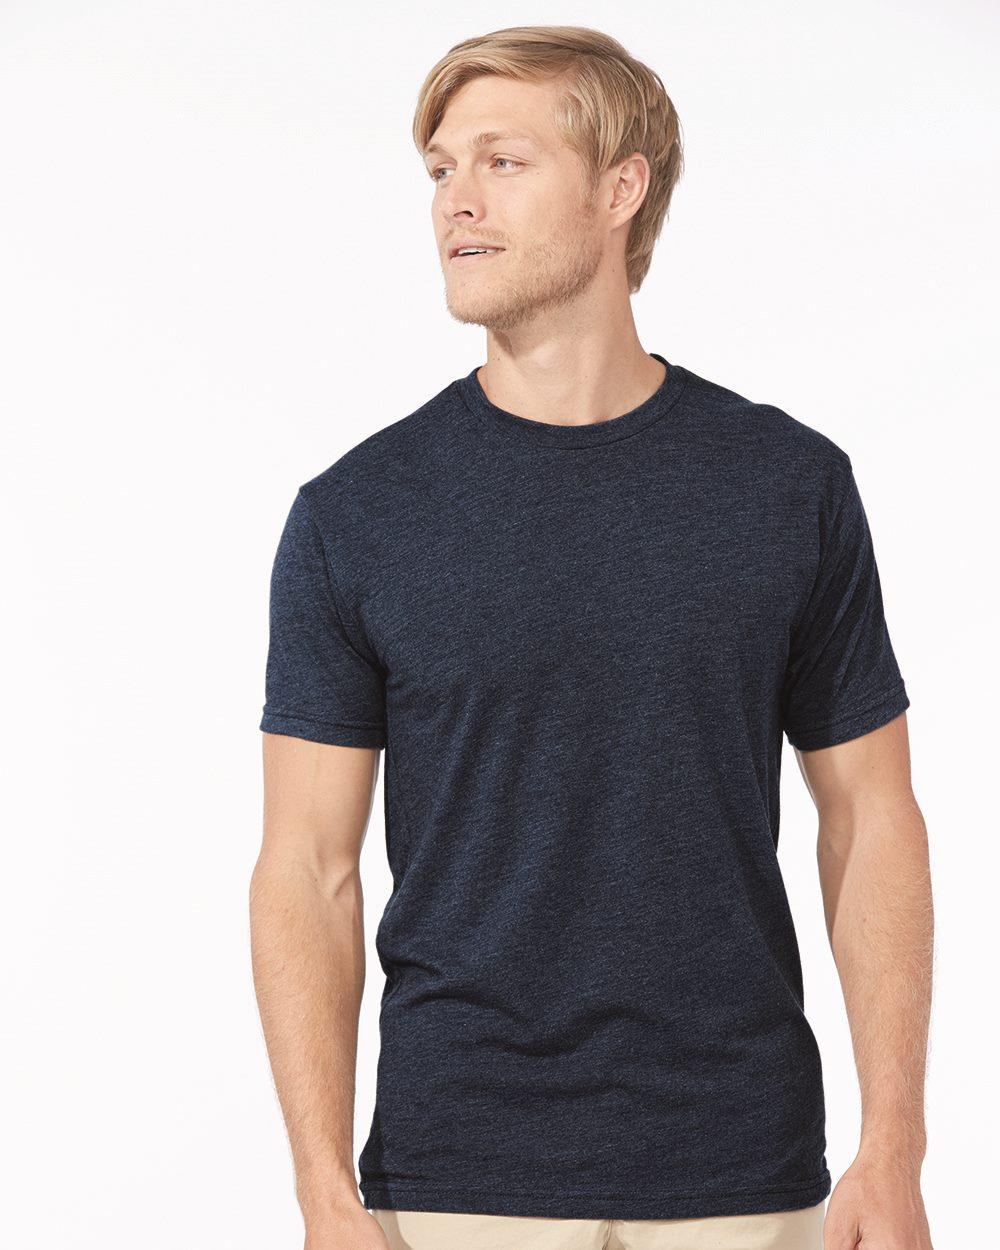 Next Level Triblend Short Sleeve - 6010             Starting at $6.00 Blank